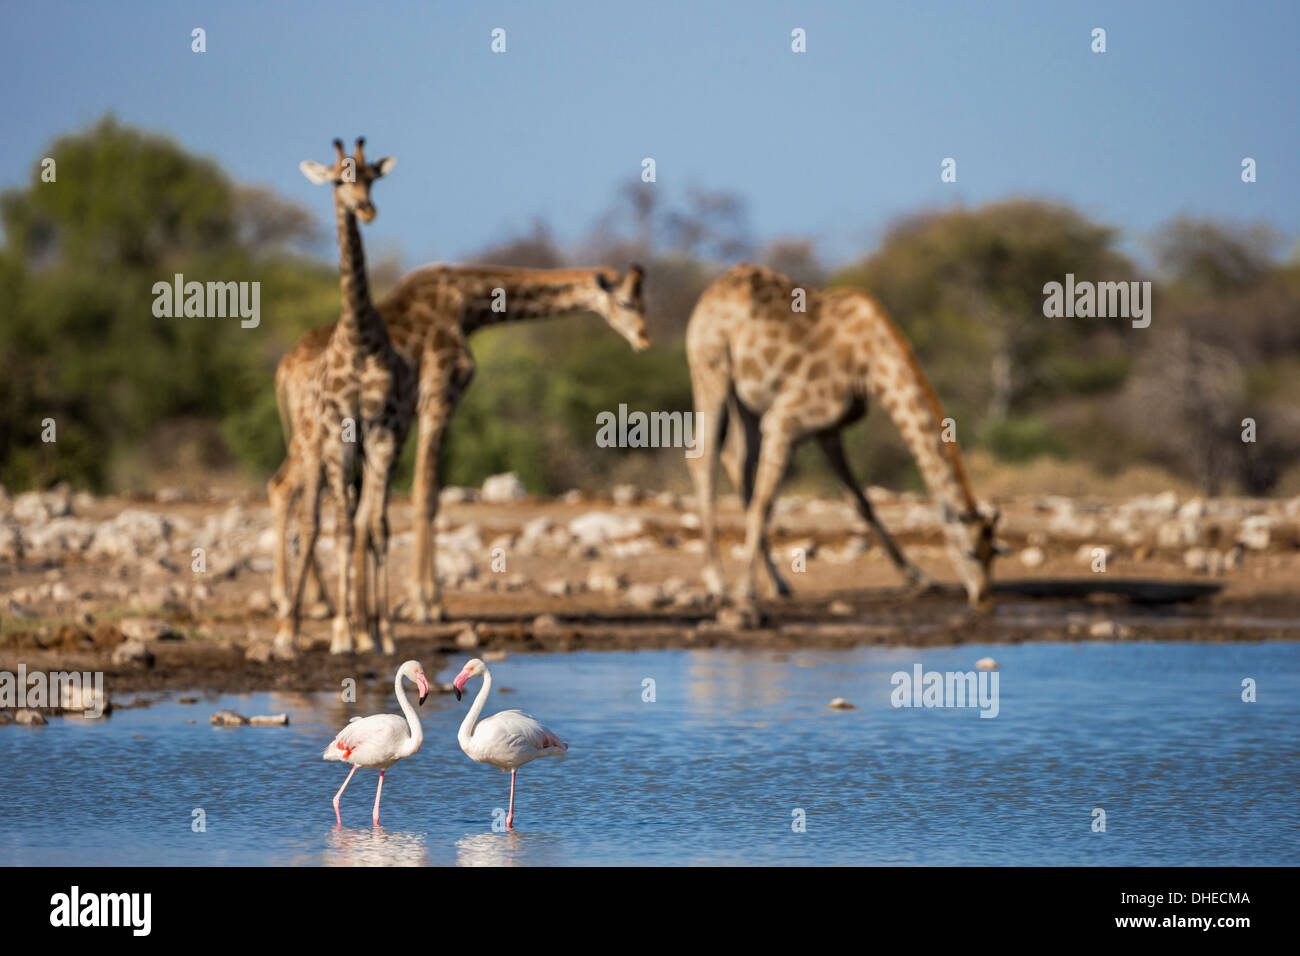 Girafe (Giraffa camelopardalis) , grand flamants roses (Phoenicopterus ruber), Etosha National Park, Namibie, Afrique Photo Stock